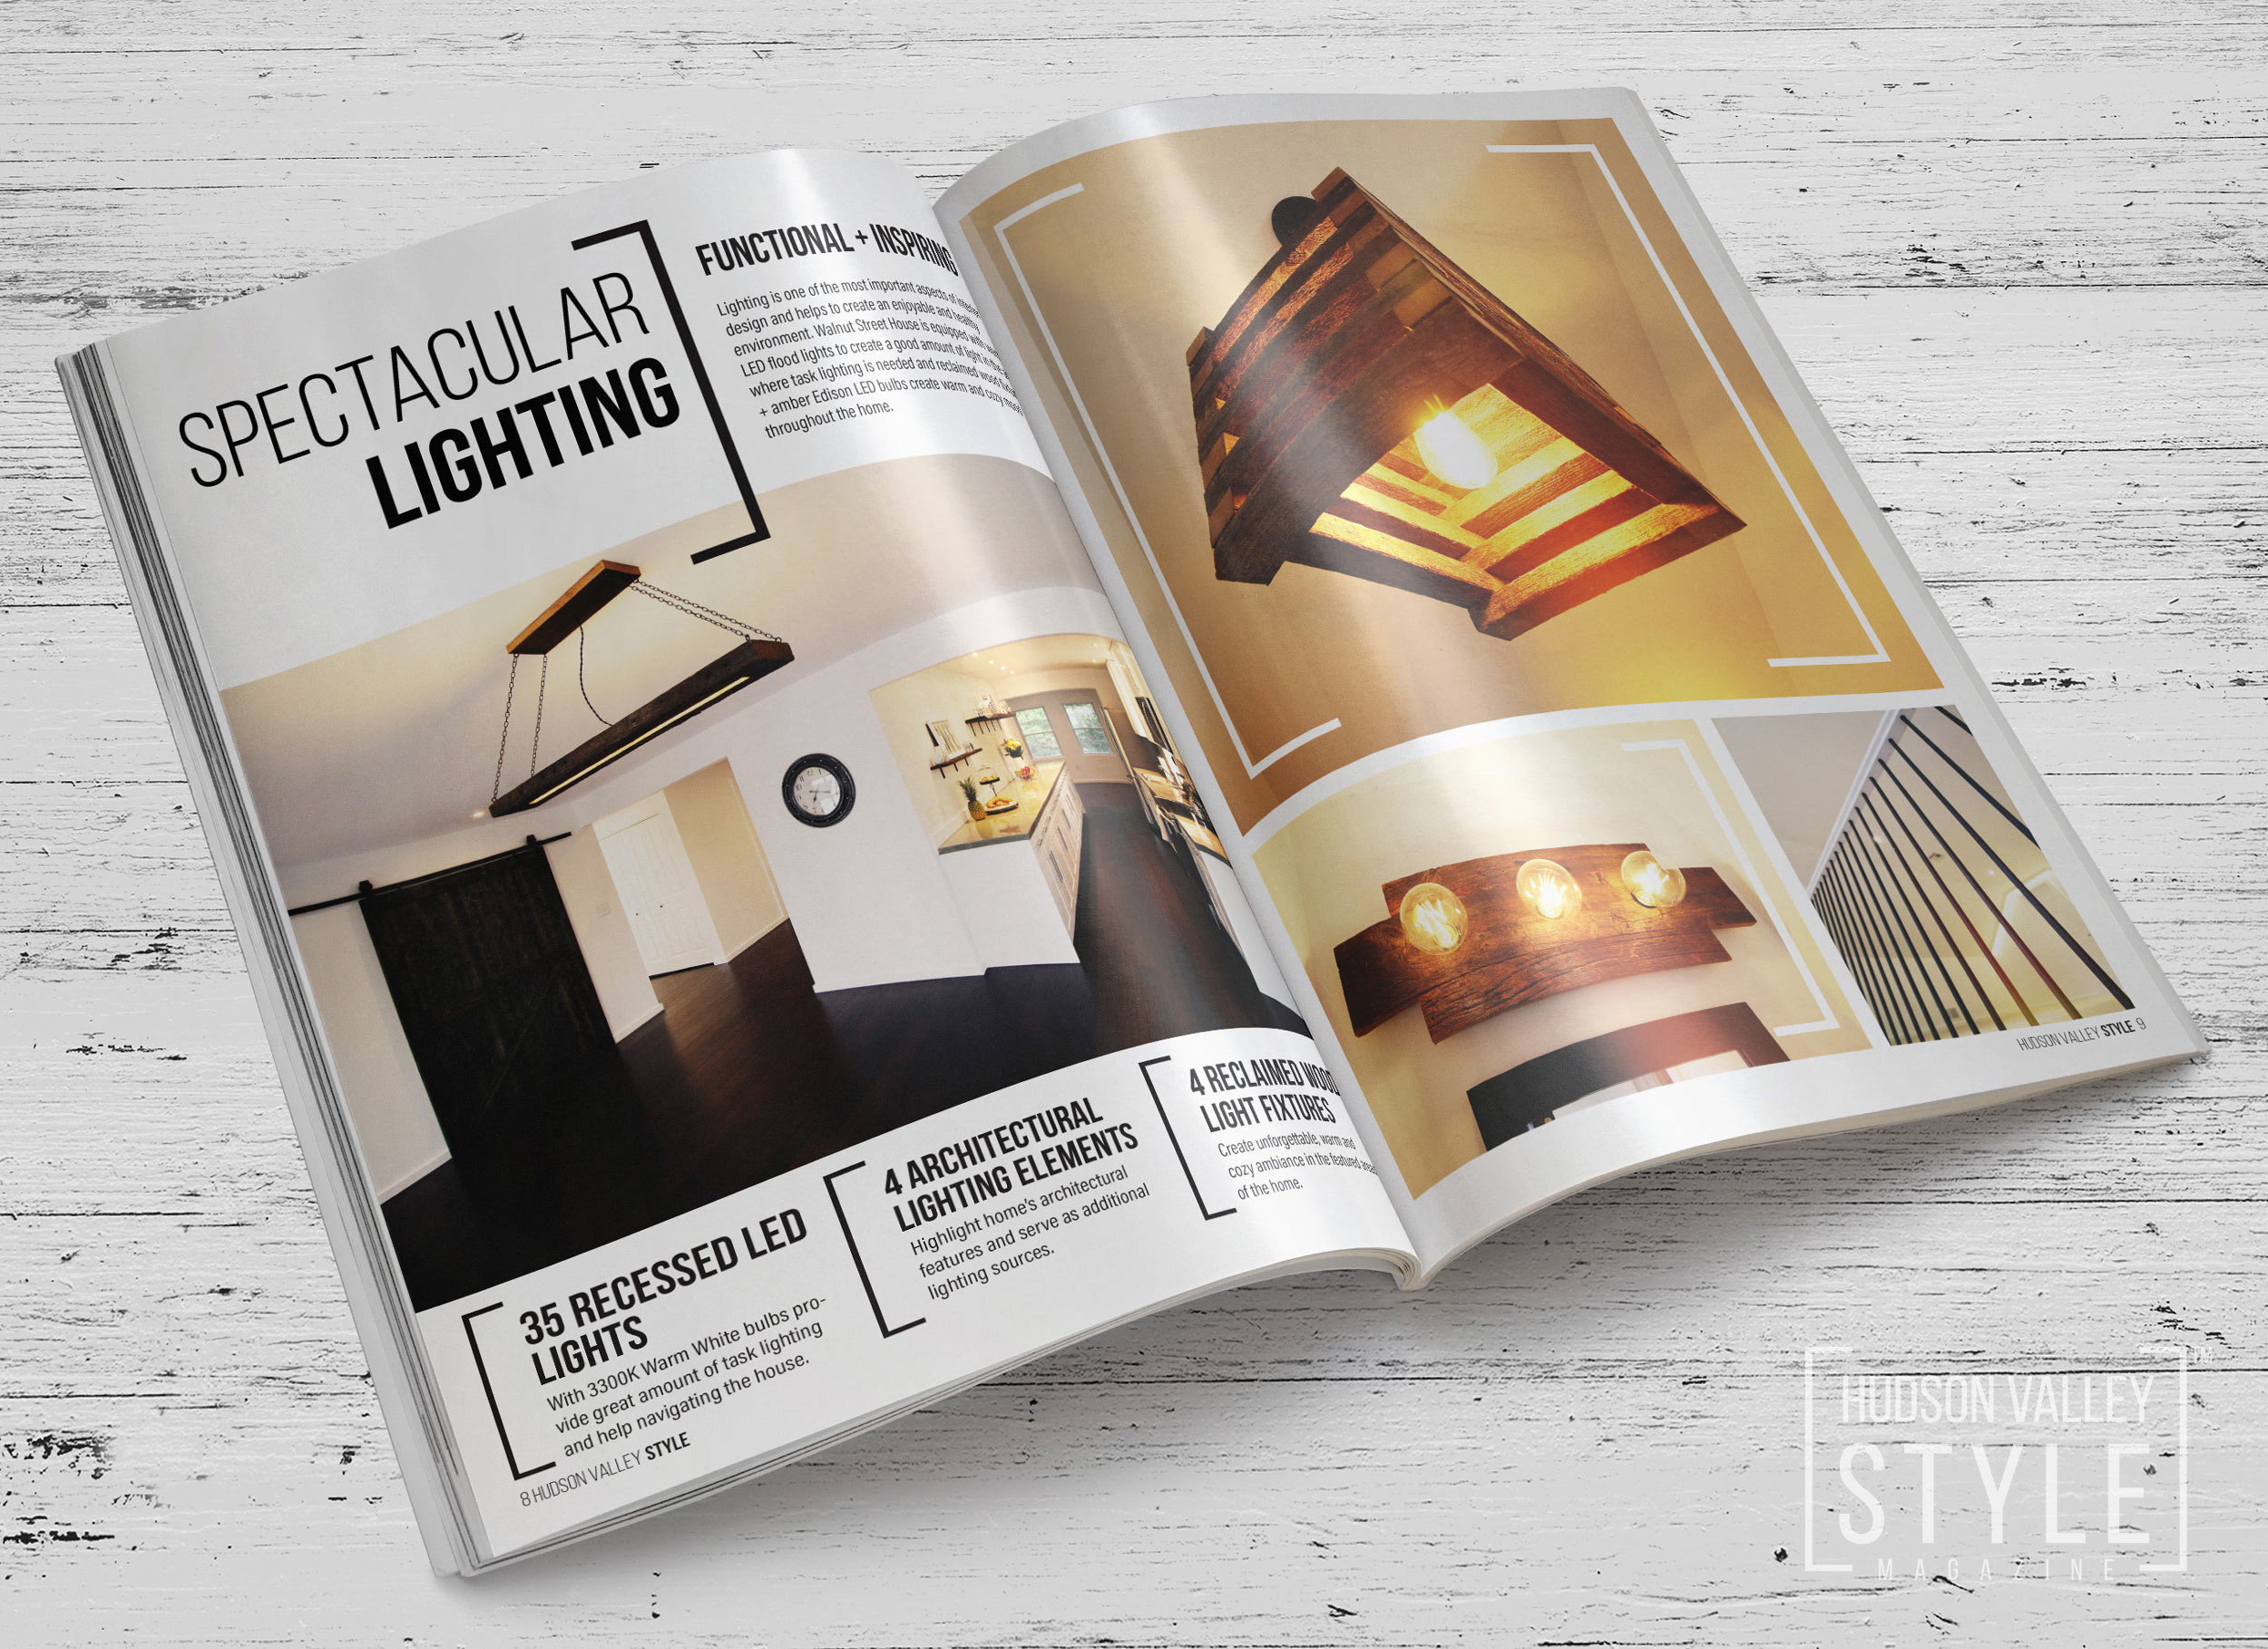 Custom Light Fixtures Design / Hudson Valley, New York Home Design and Renovation Project by Duncan Avenue Design Studio